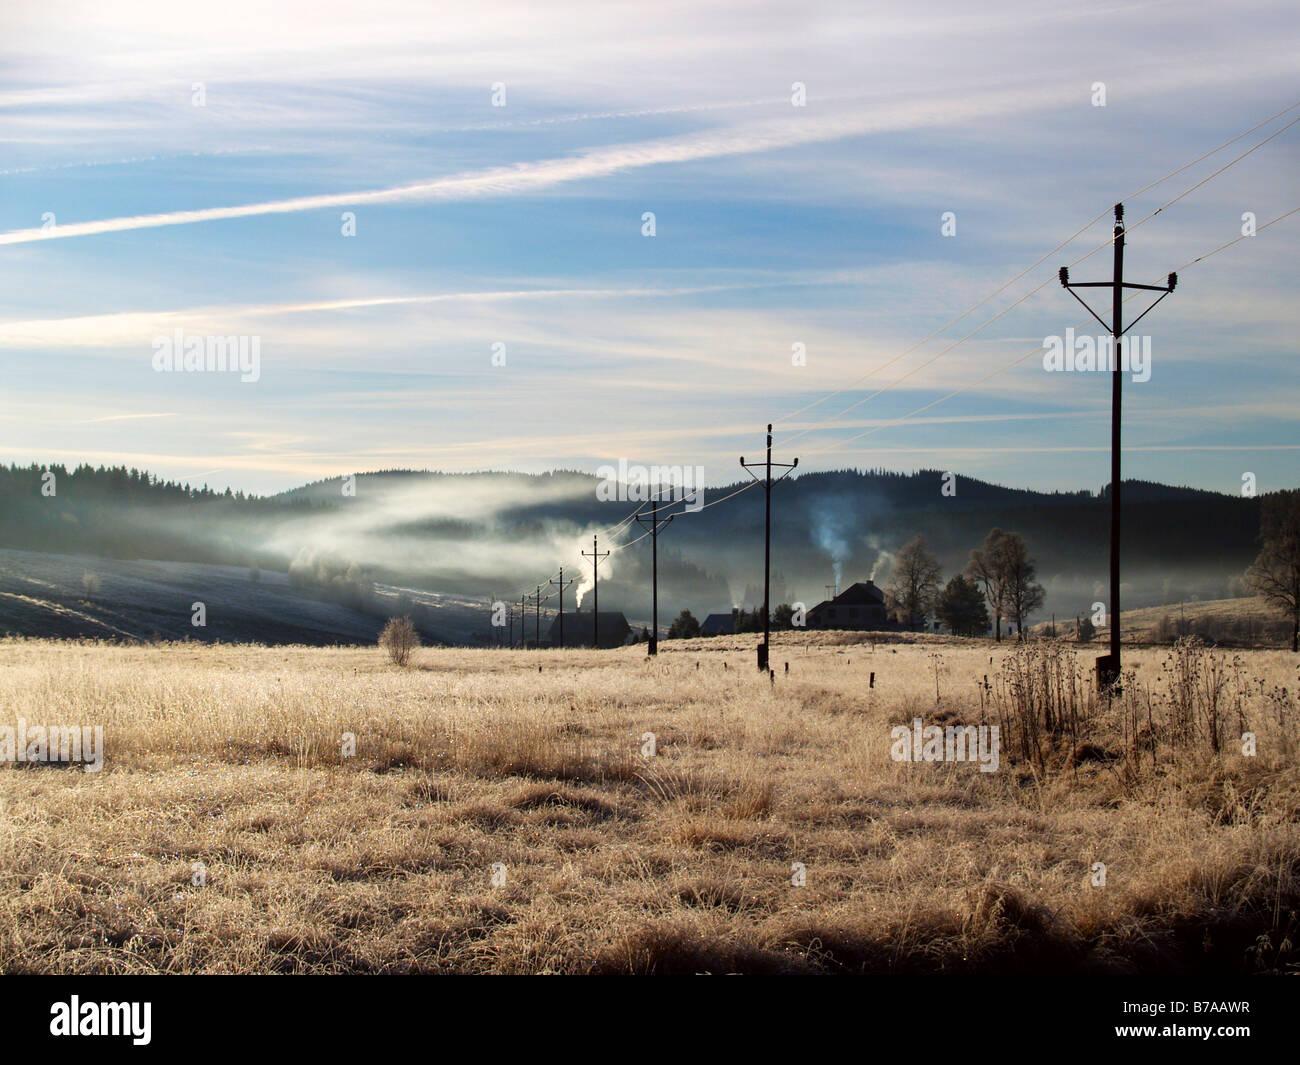 Kvilda, Bohemian Forest National Park, Sumava National Park, Bohemia, Czech Republic, Europe - Stock Image